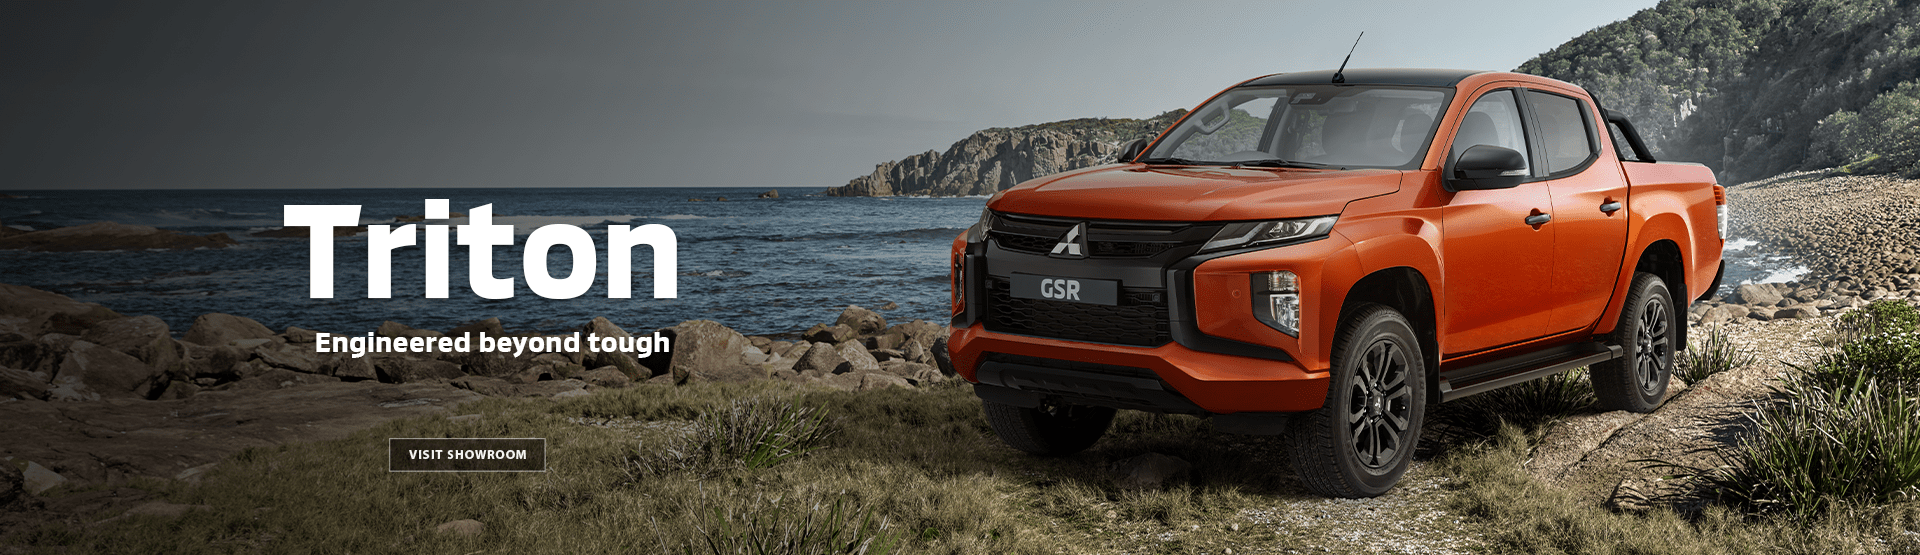 Mitsubishi Triton - Engineered beyond tough